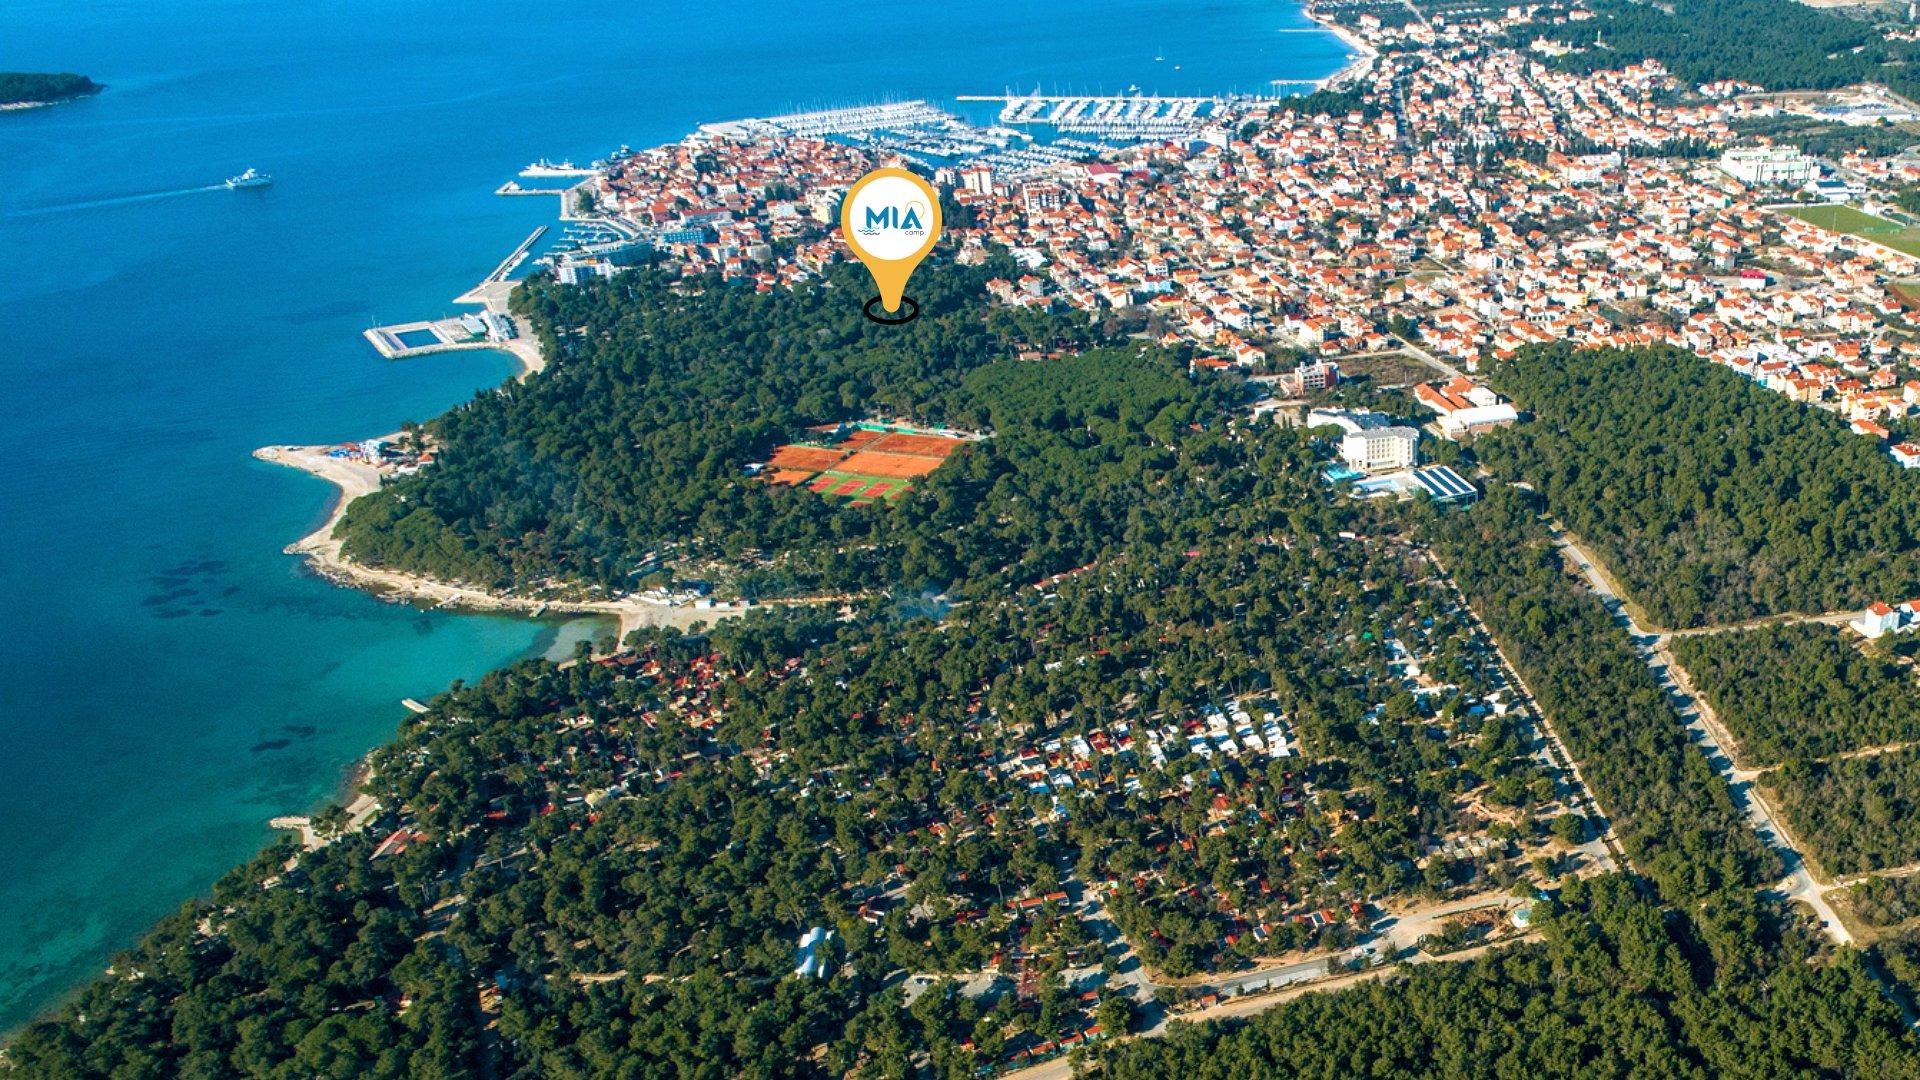 Location of camp Mia